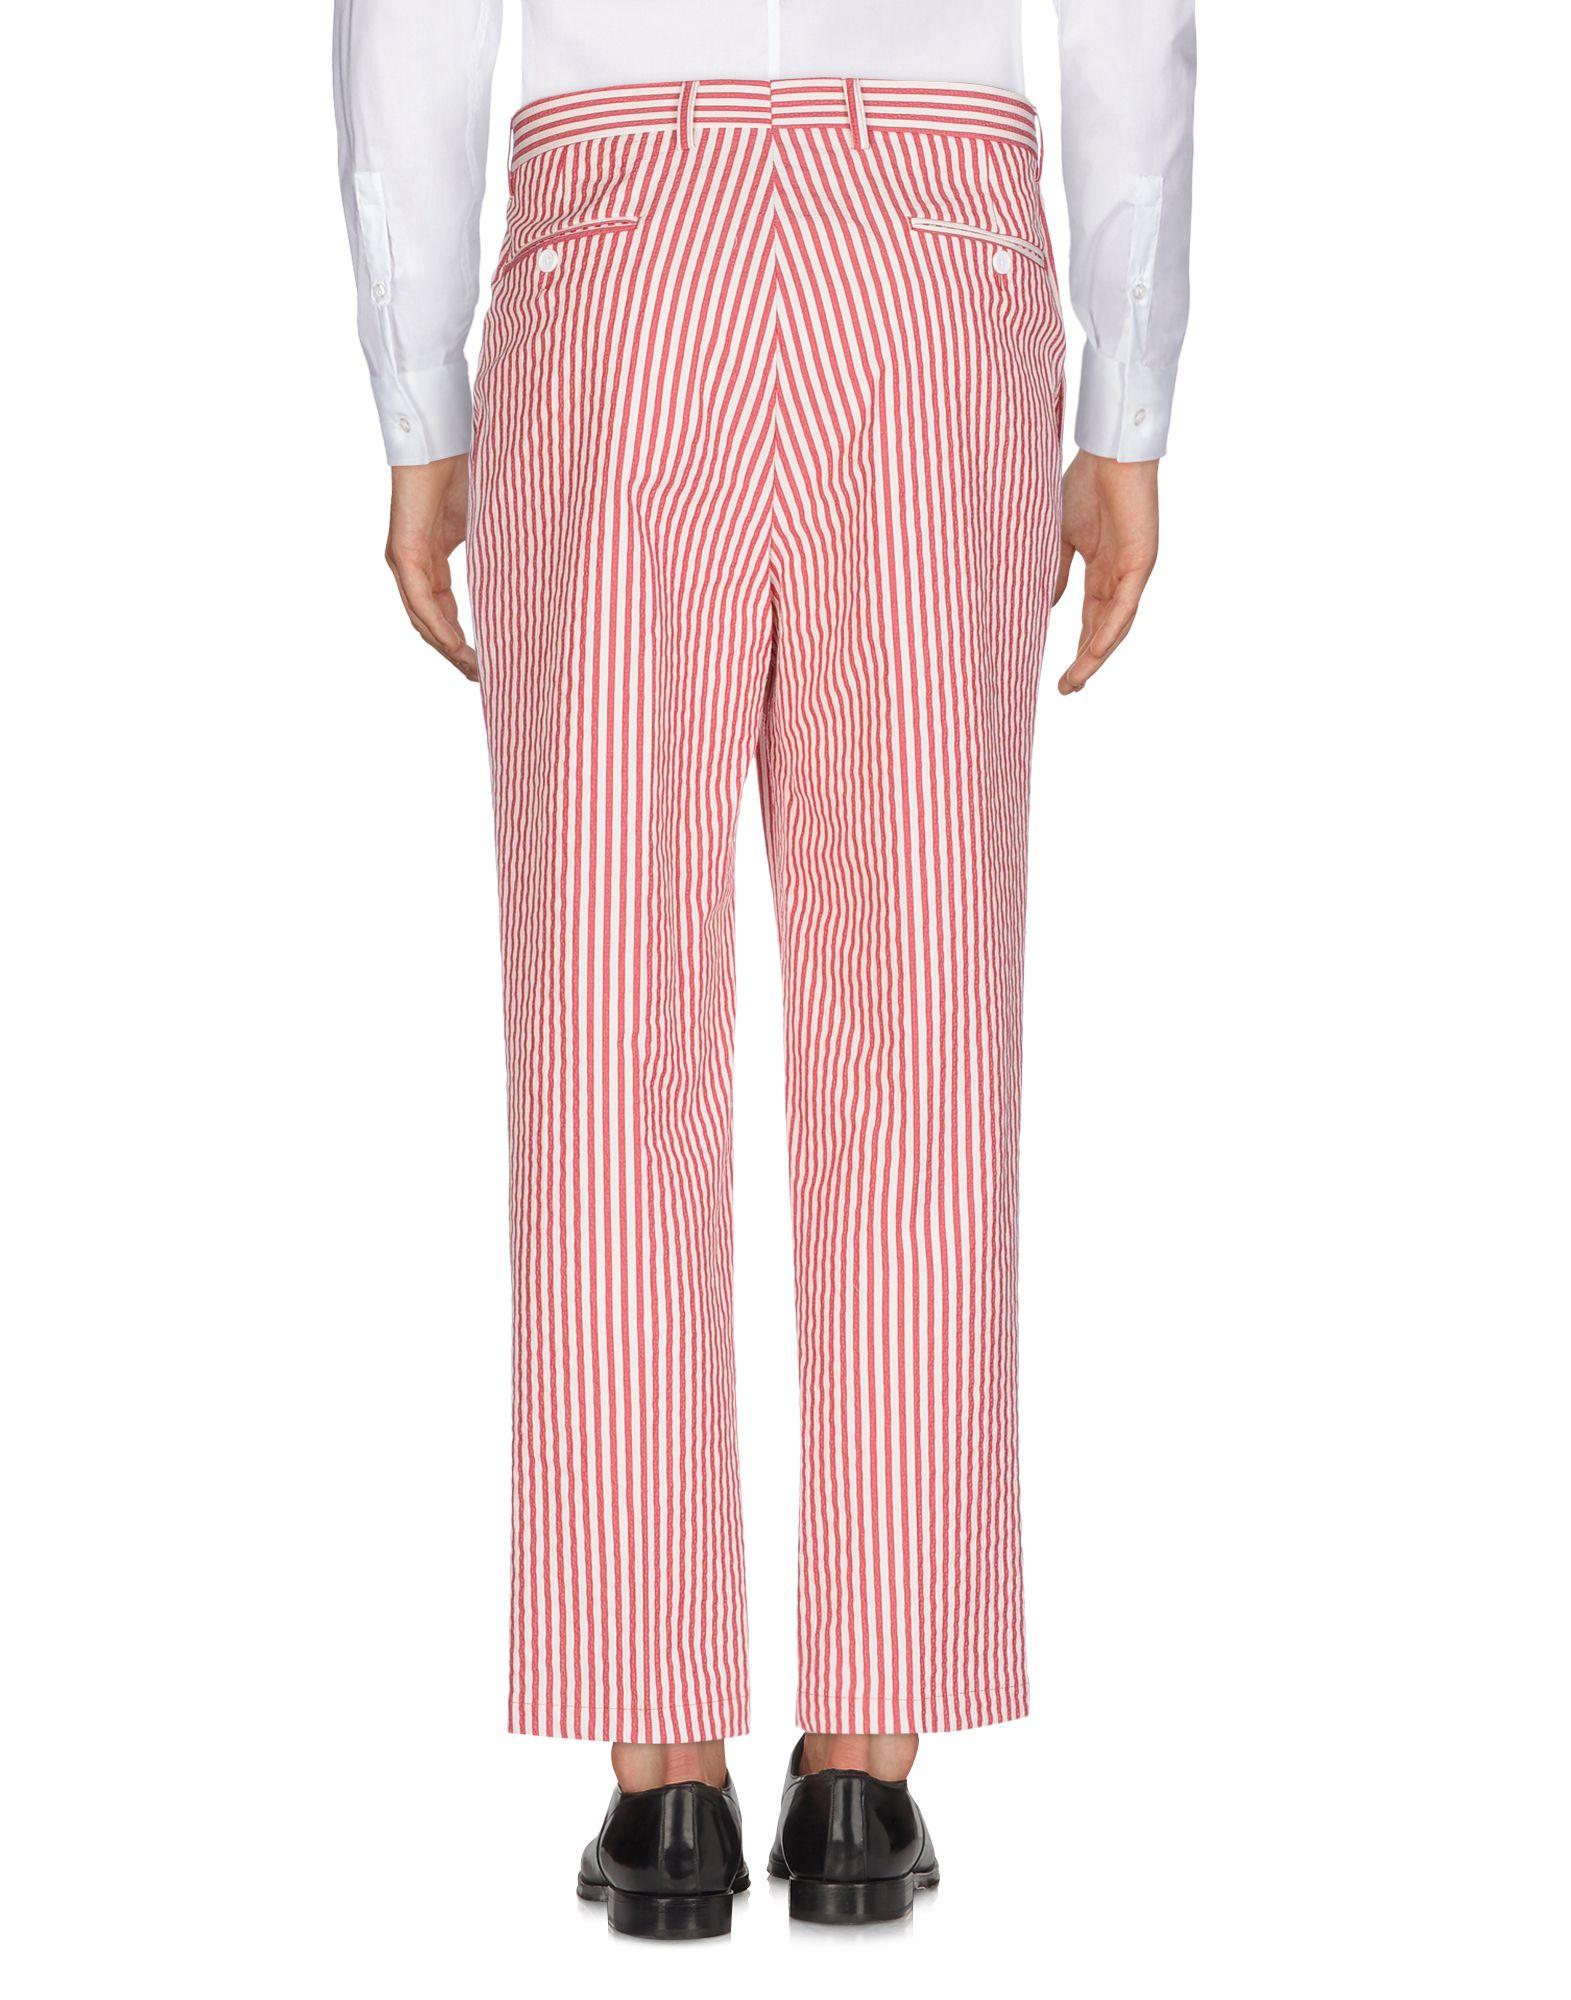 A A A buon mercato Pantalone Lc23 Uomo - 13151102BG a02445